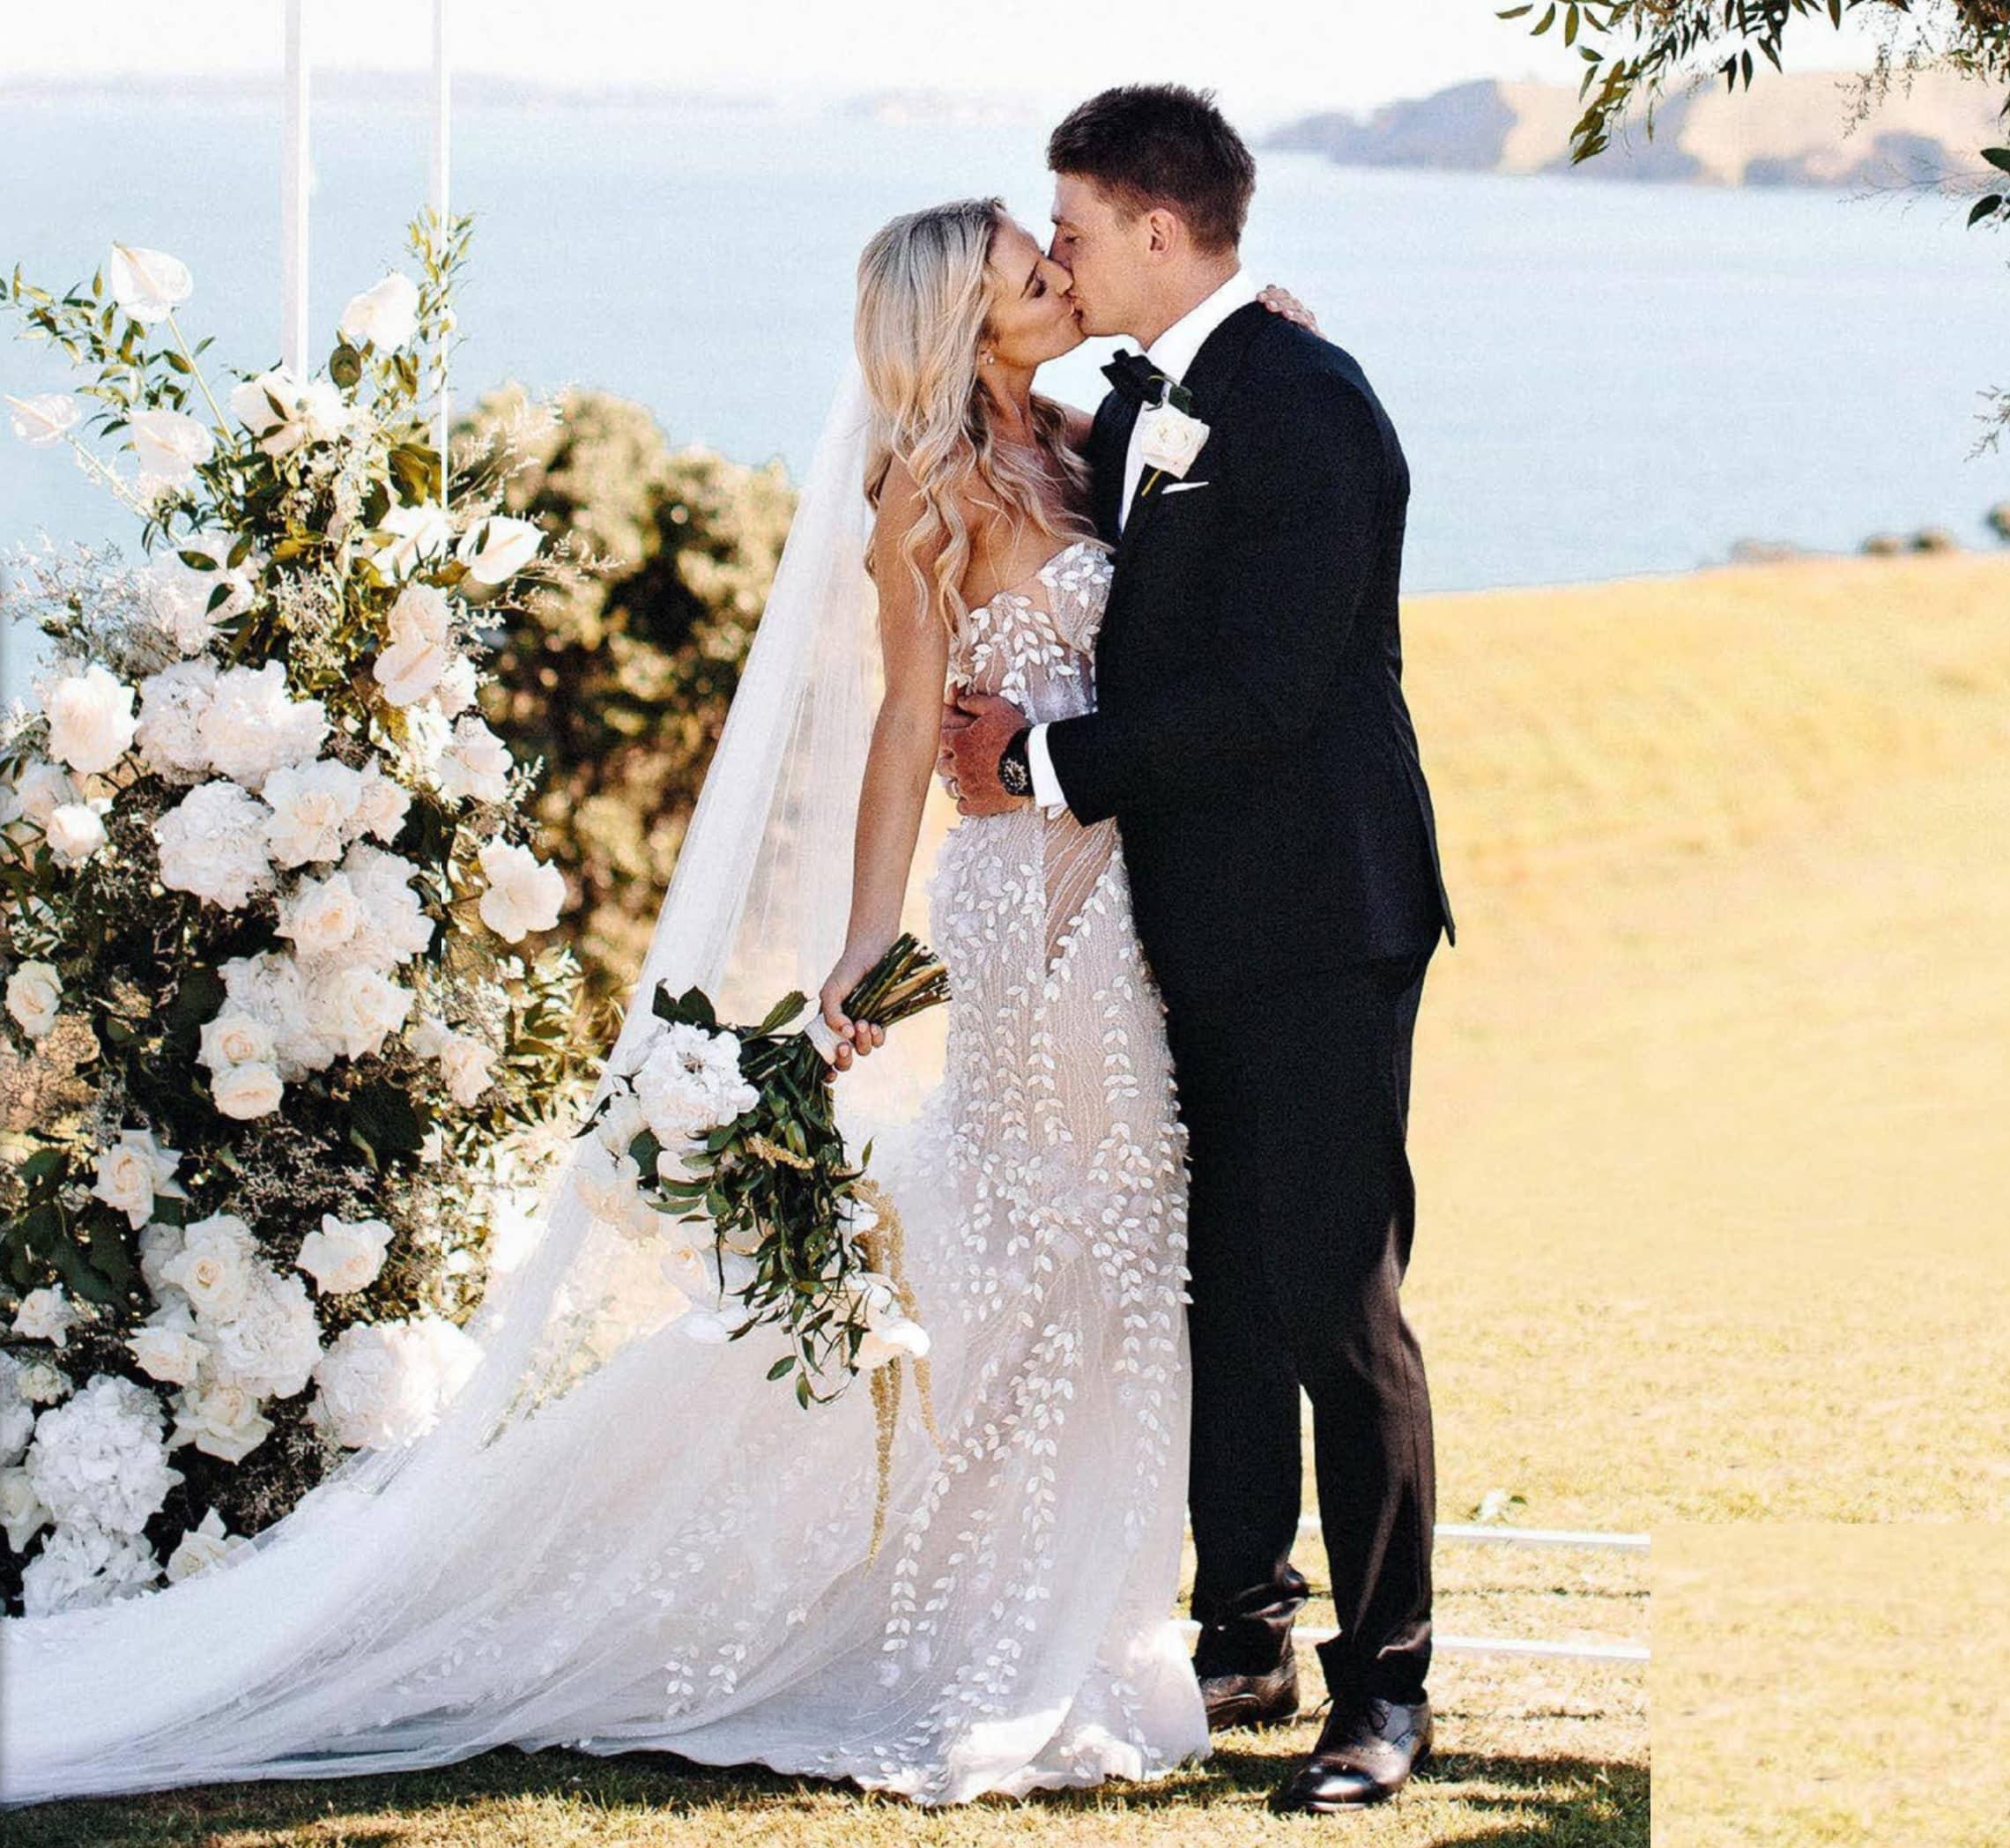 Romance & Roses On Rakino - Beauden & Hannah's Beautiful Big Day